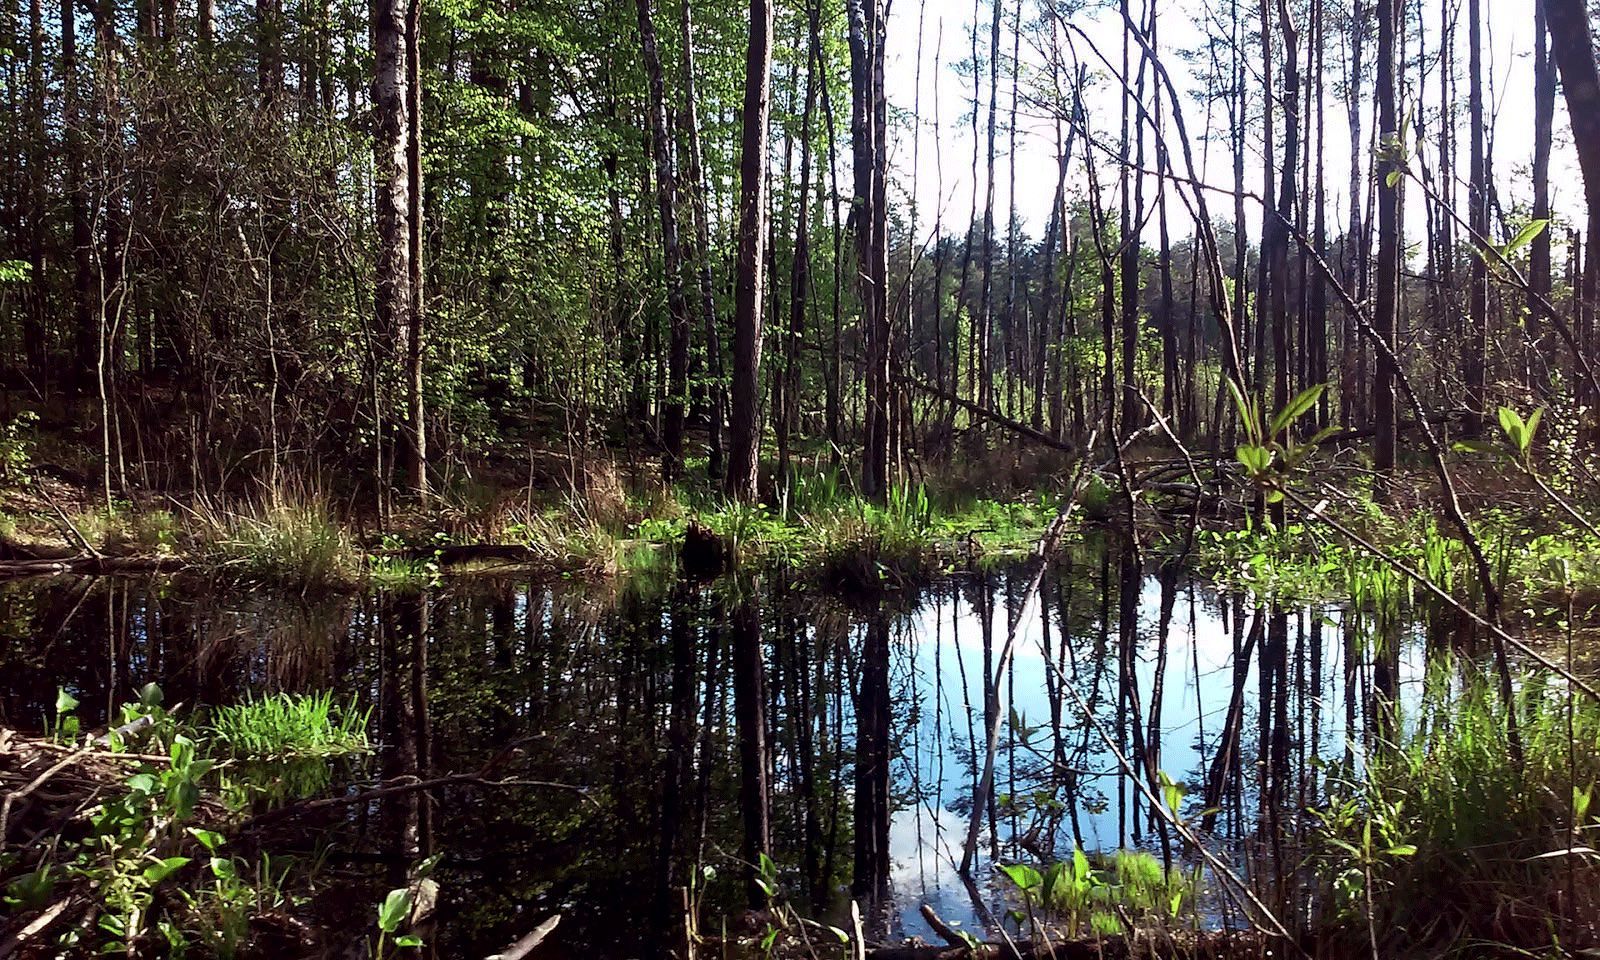 Prypjat marshes near Lyaskovichi Belarus